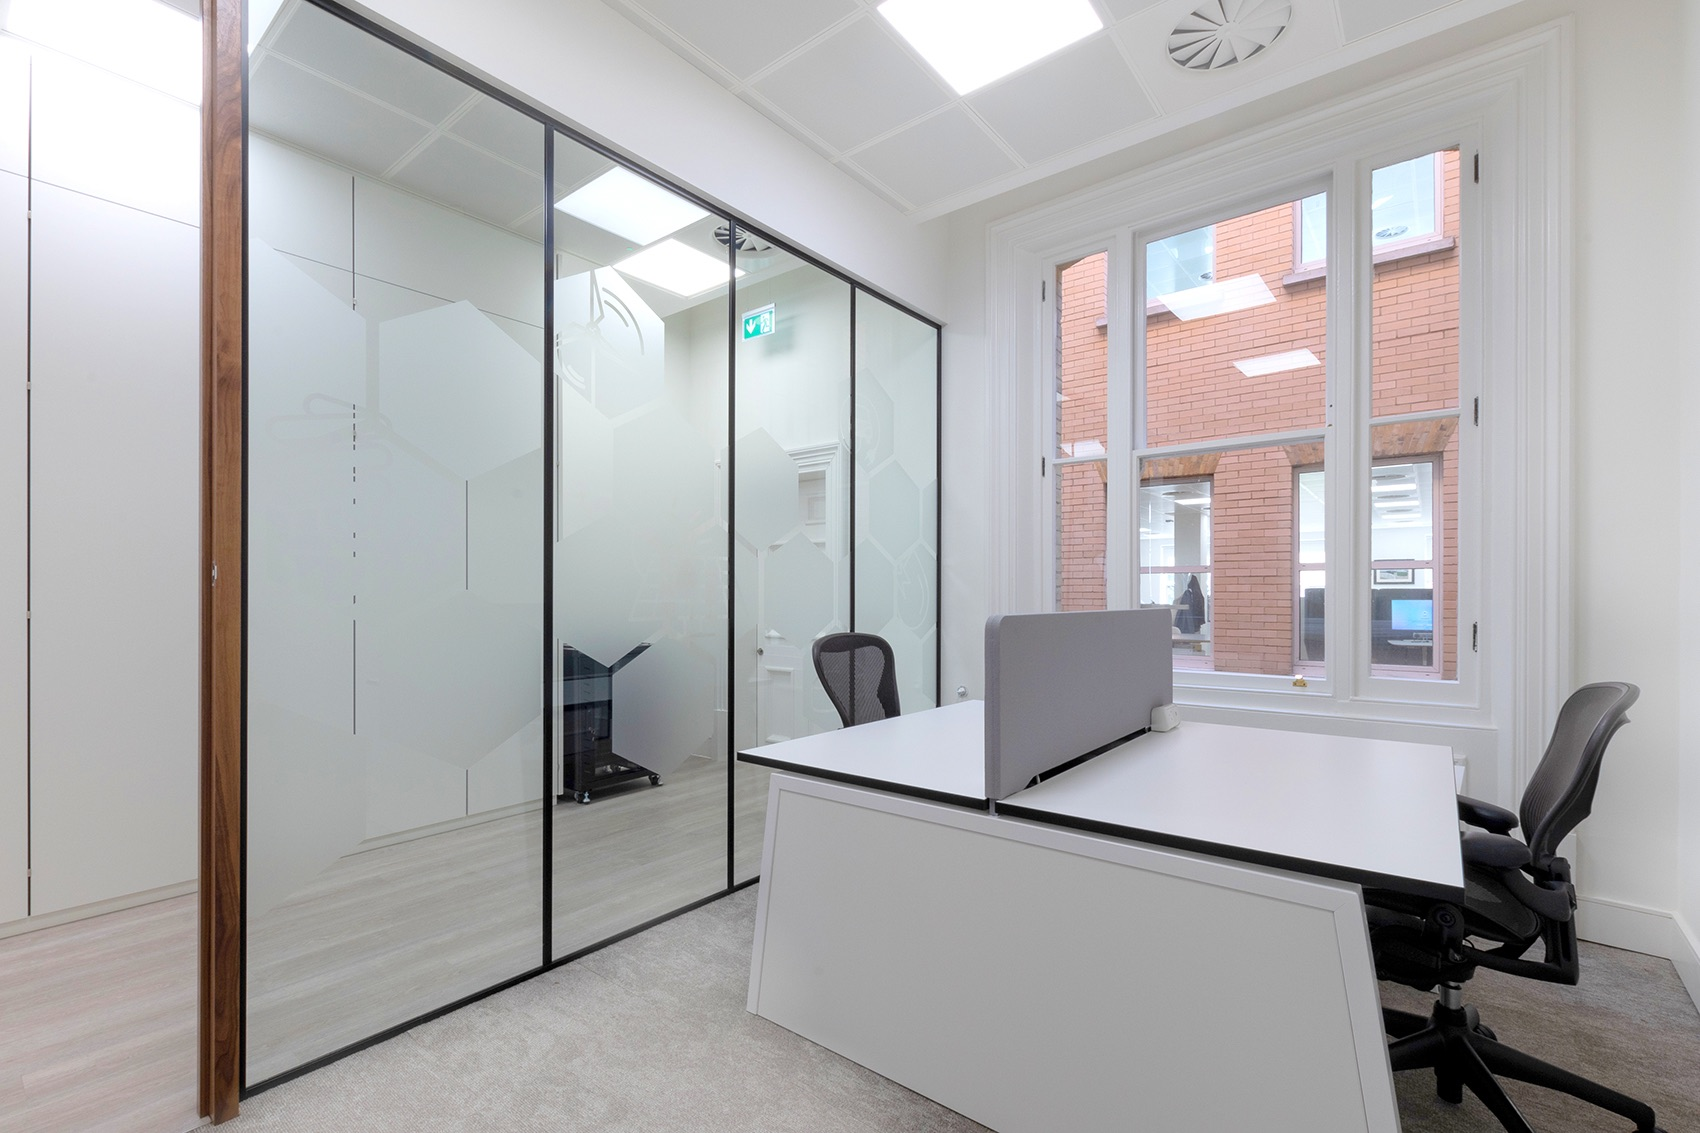 iona-capital-london-office-11